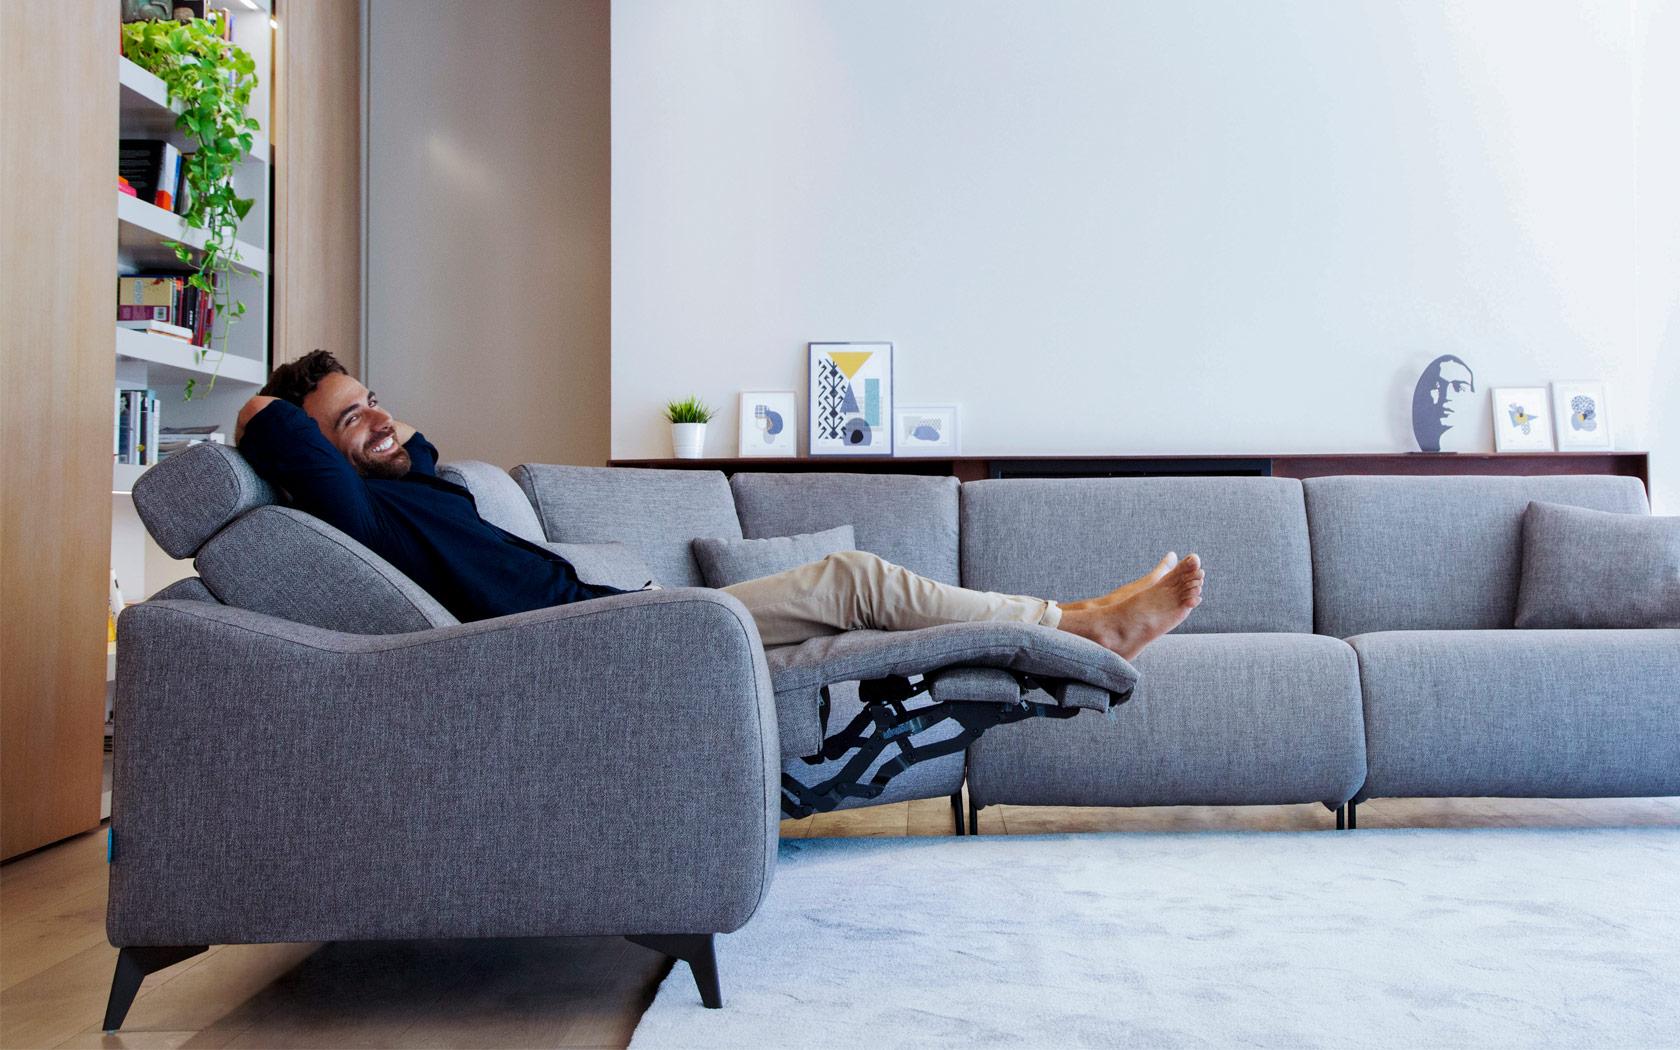 Atlanta sofa relax 2020 02